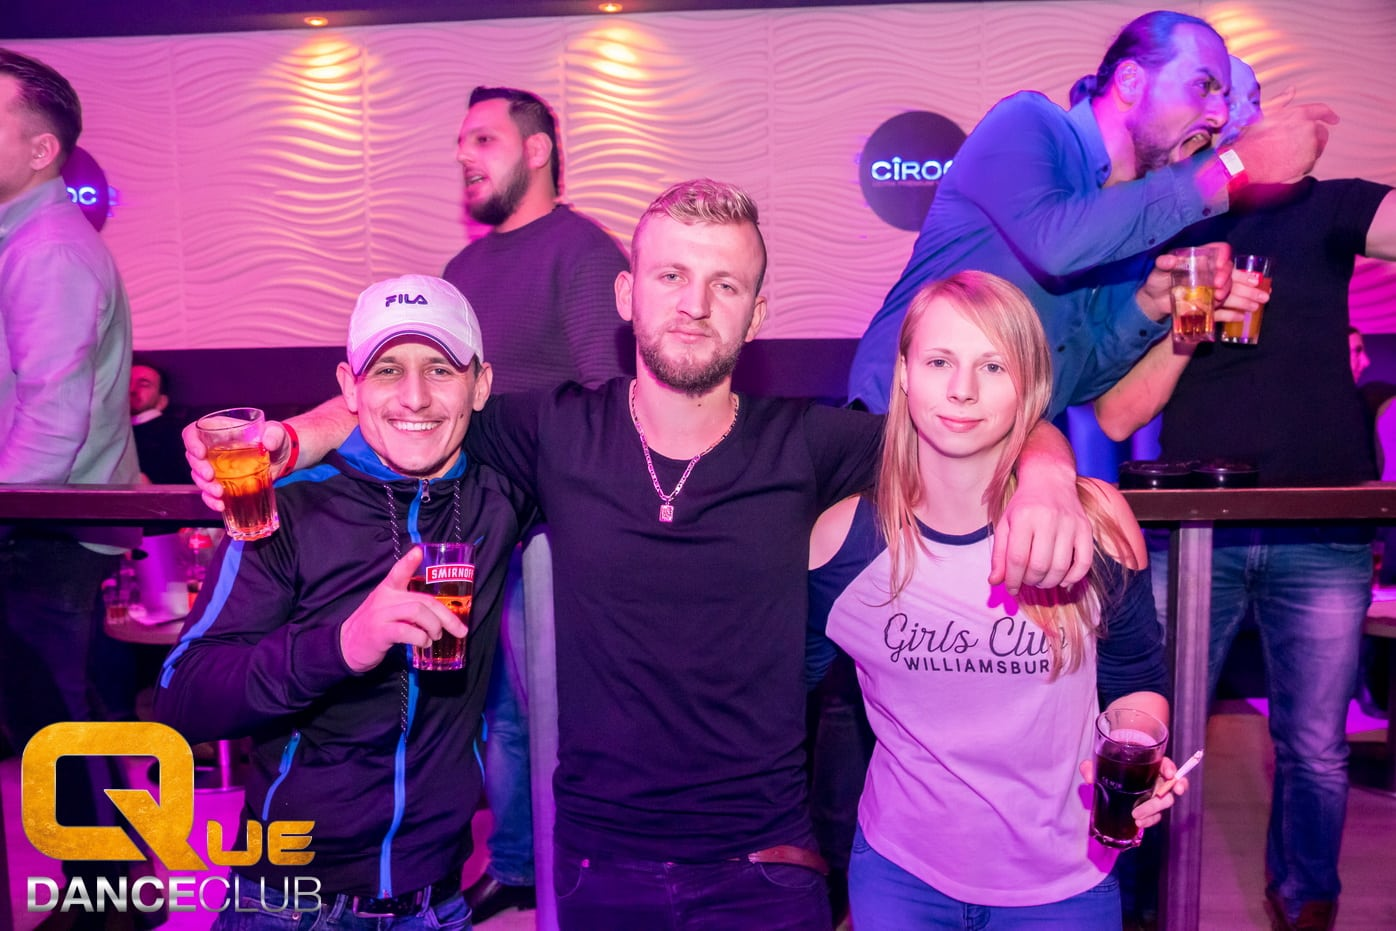 2018_12_08_Que_Danceclub_Paparazzo_Night_Ardian_Bujupi_Live_Nightlife_Scene_Timo_033